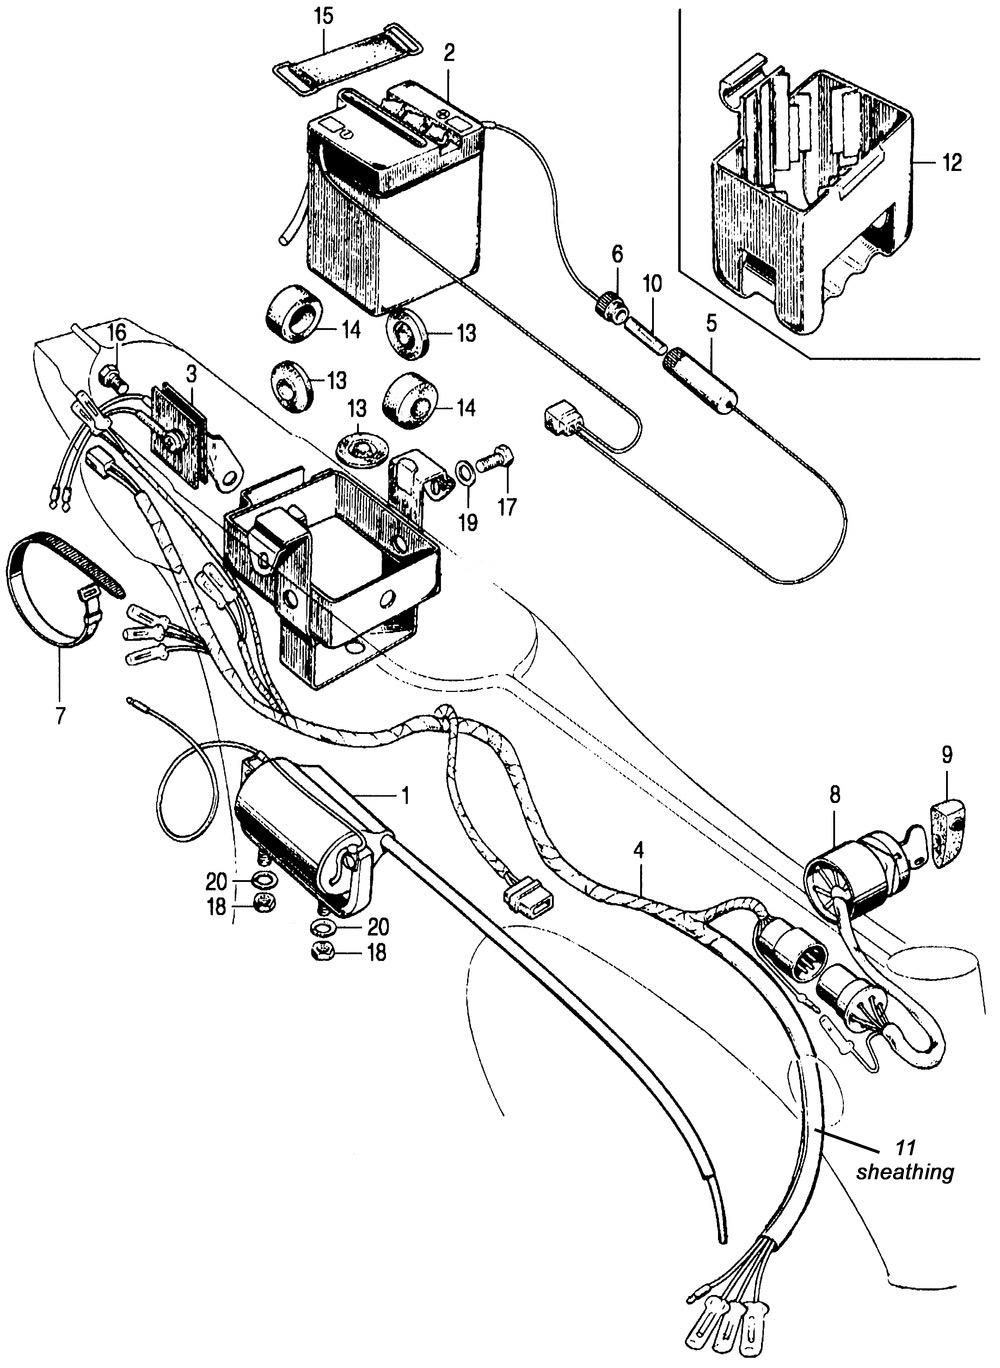 aftermarket ect wiring diagram